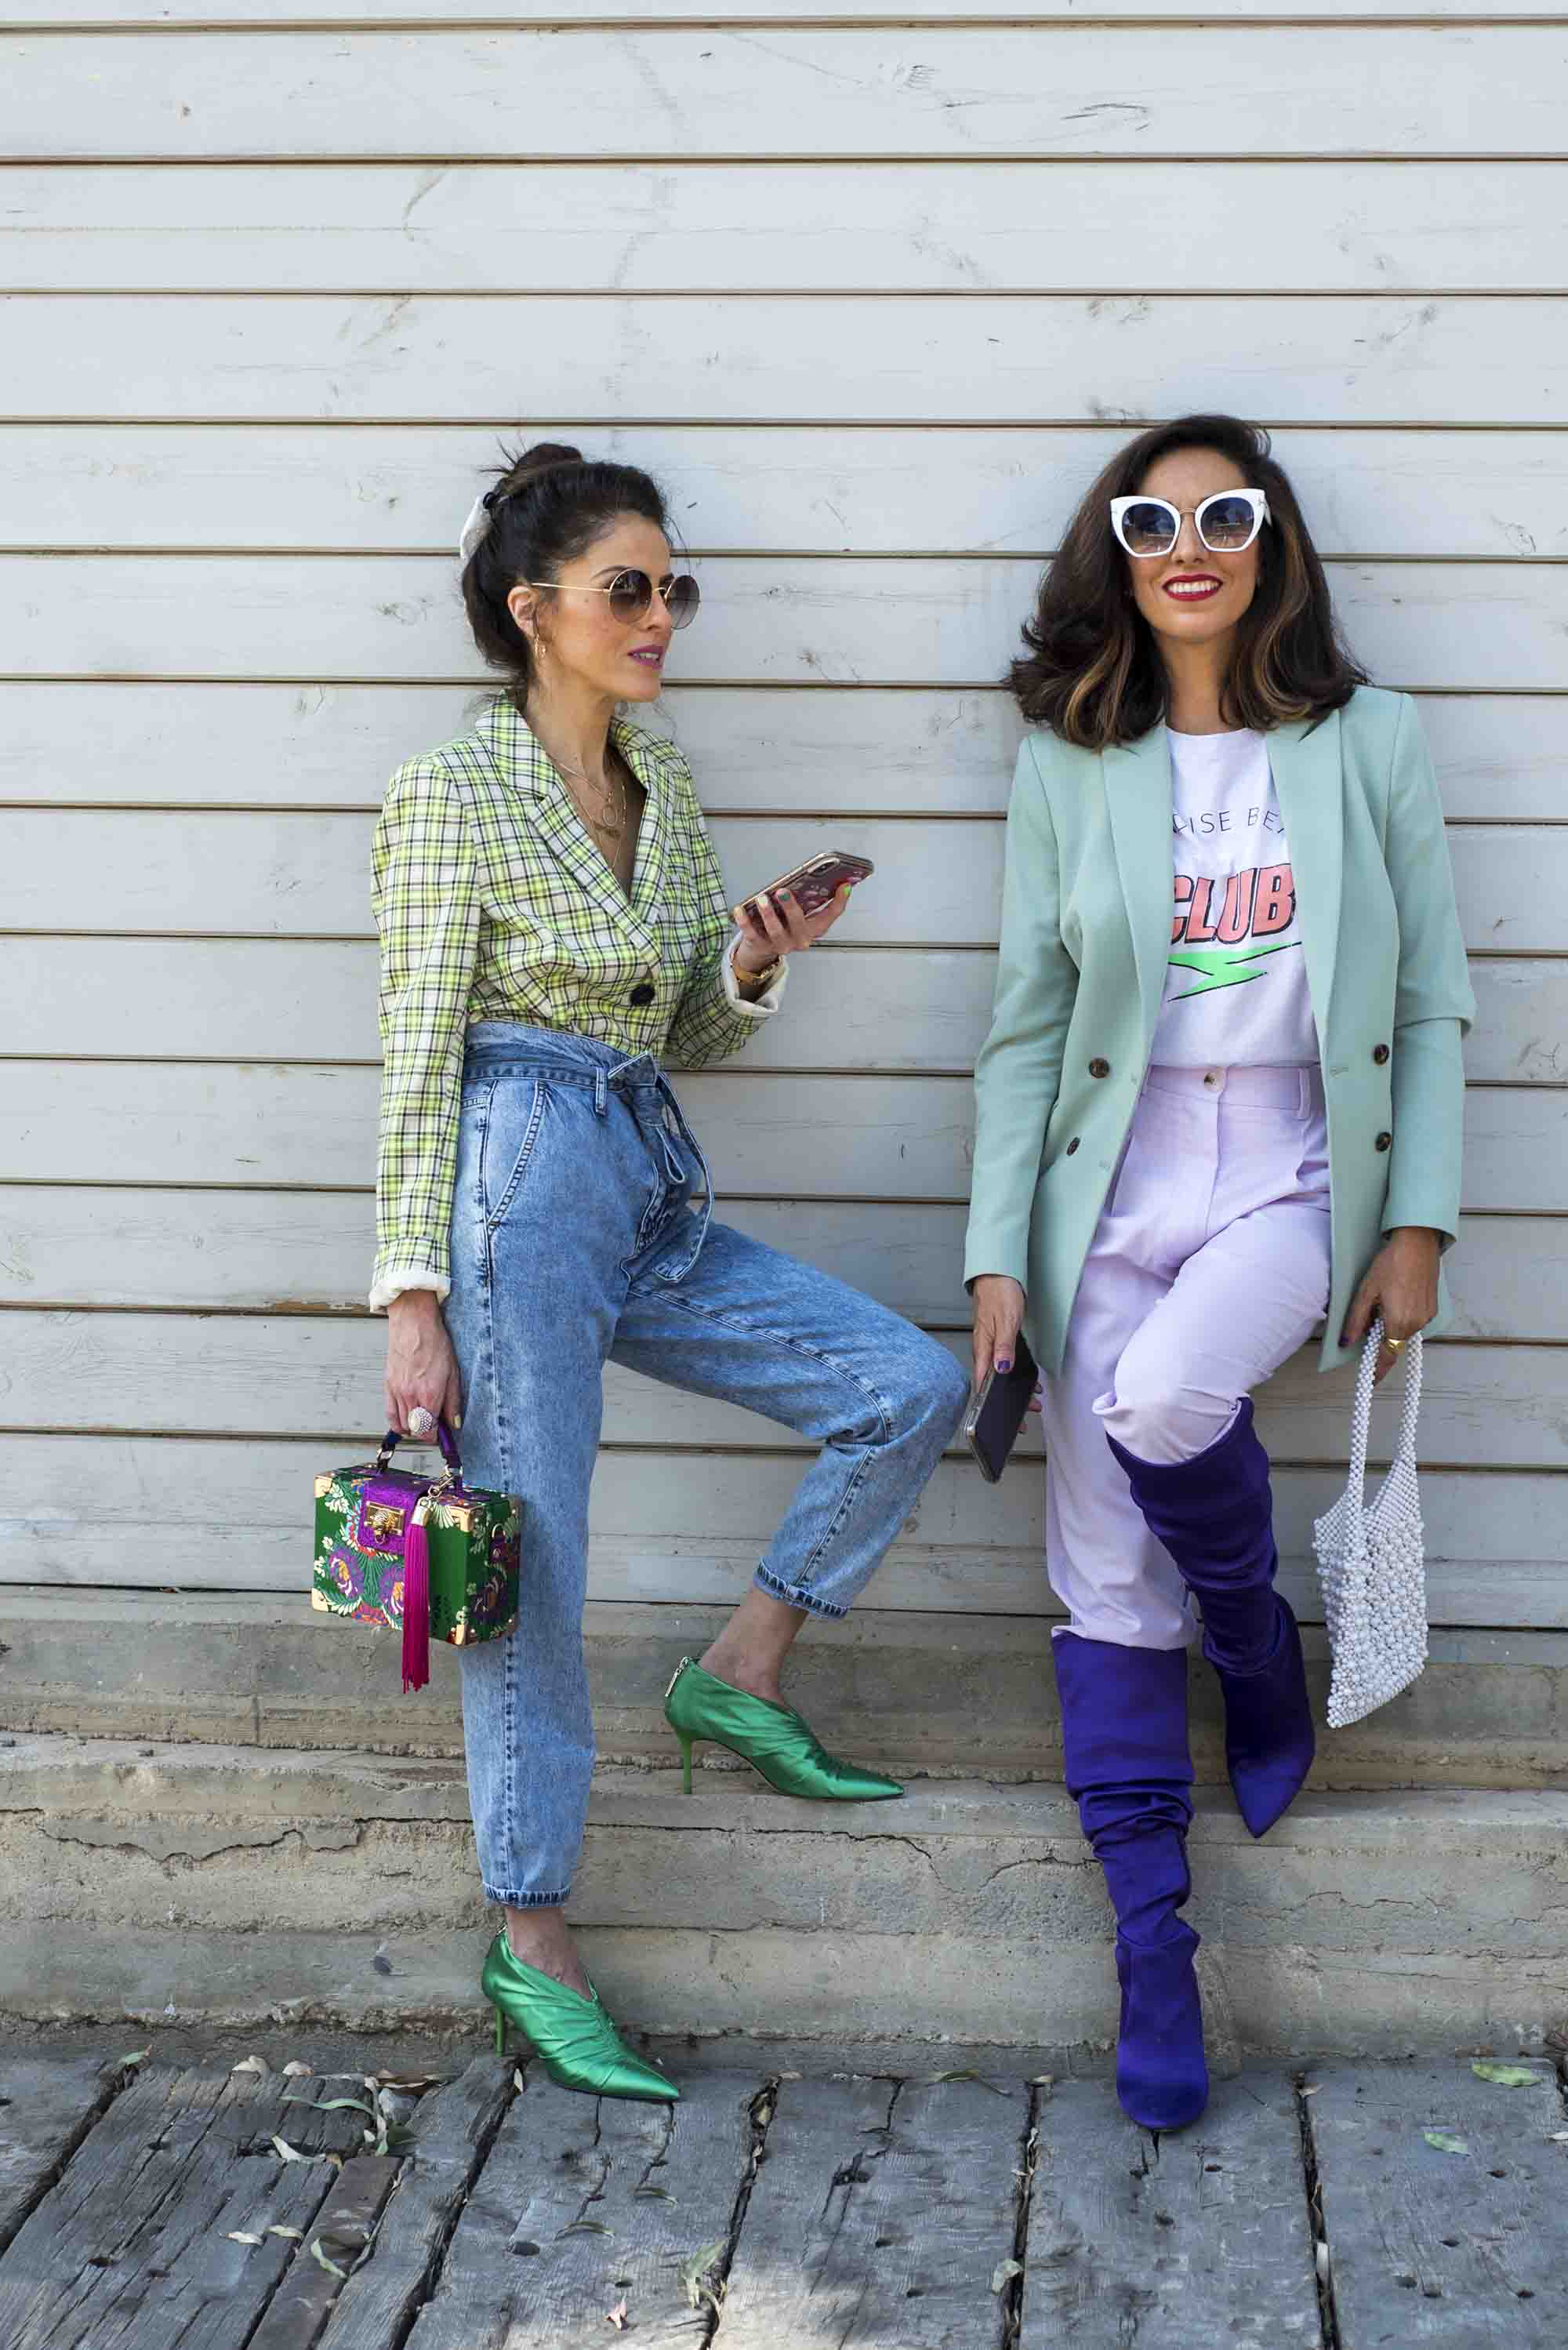 Fashion Israel-מגזין אופנה ישראלי, מירב רום, שגית שליו, צילום לימור יערי -